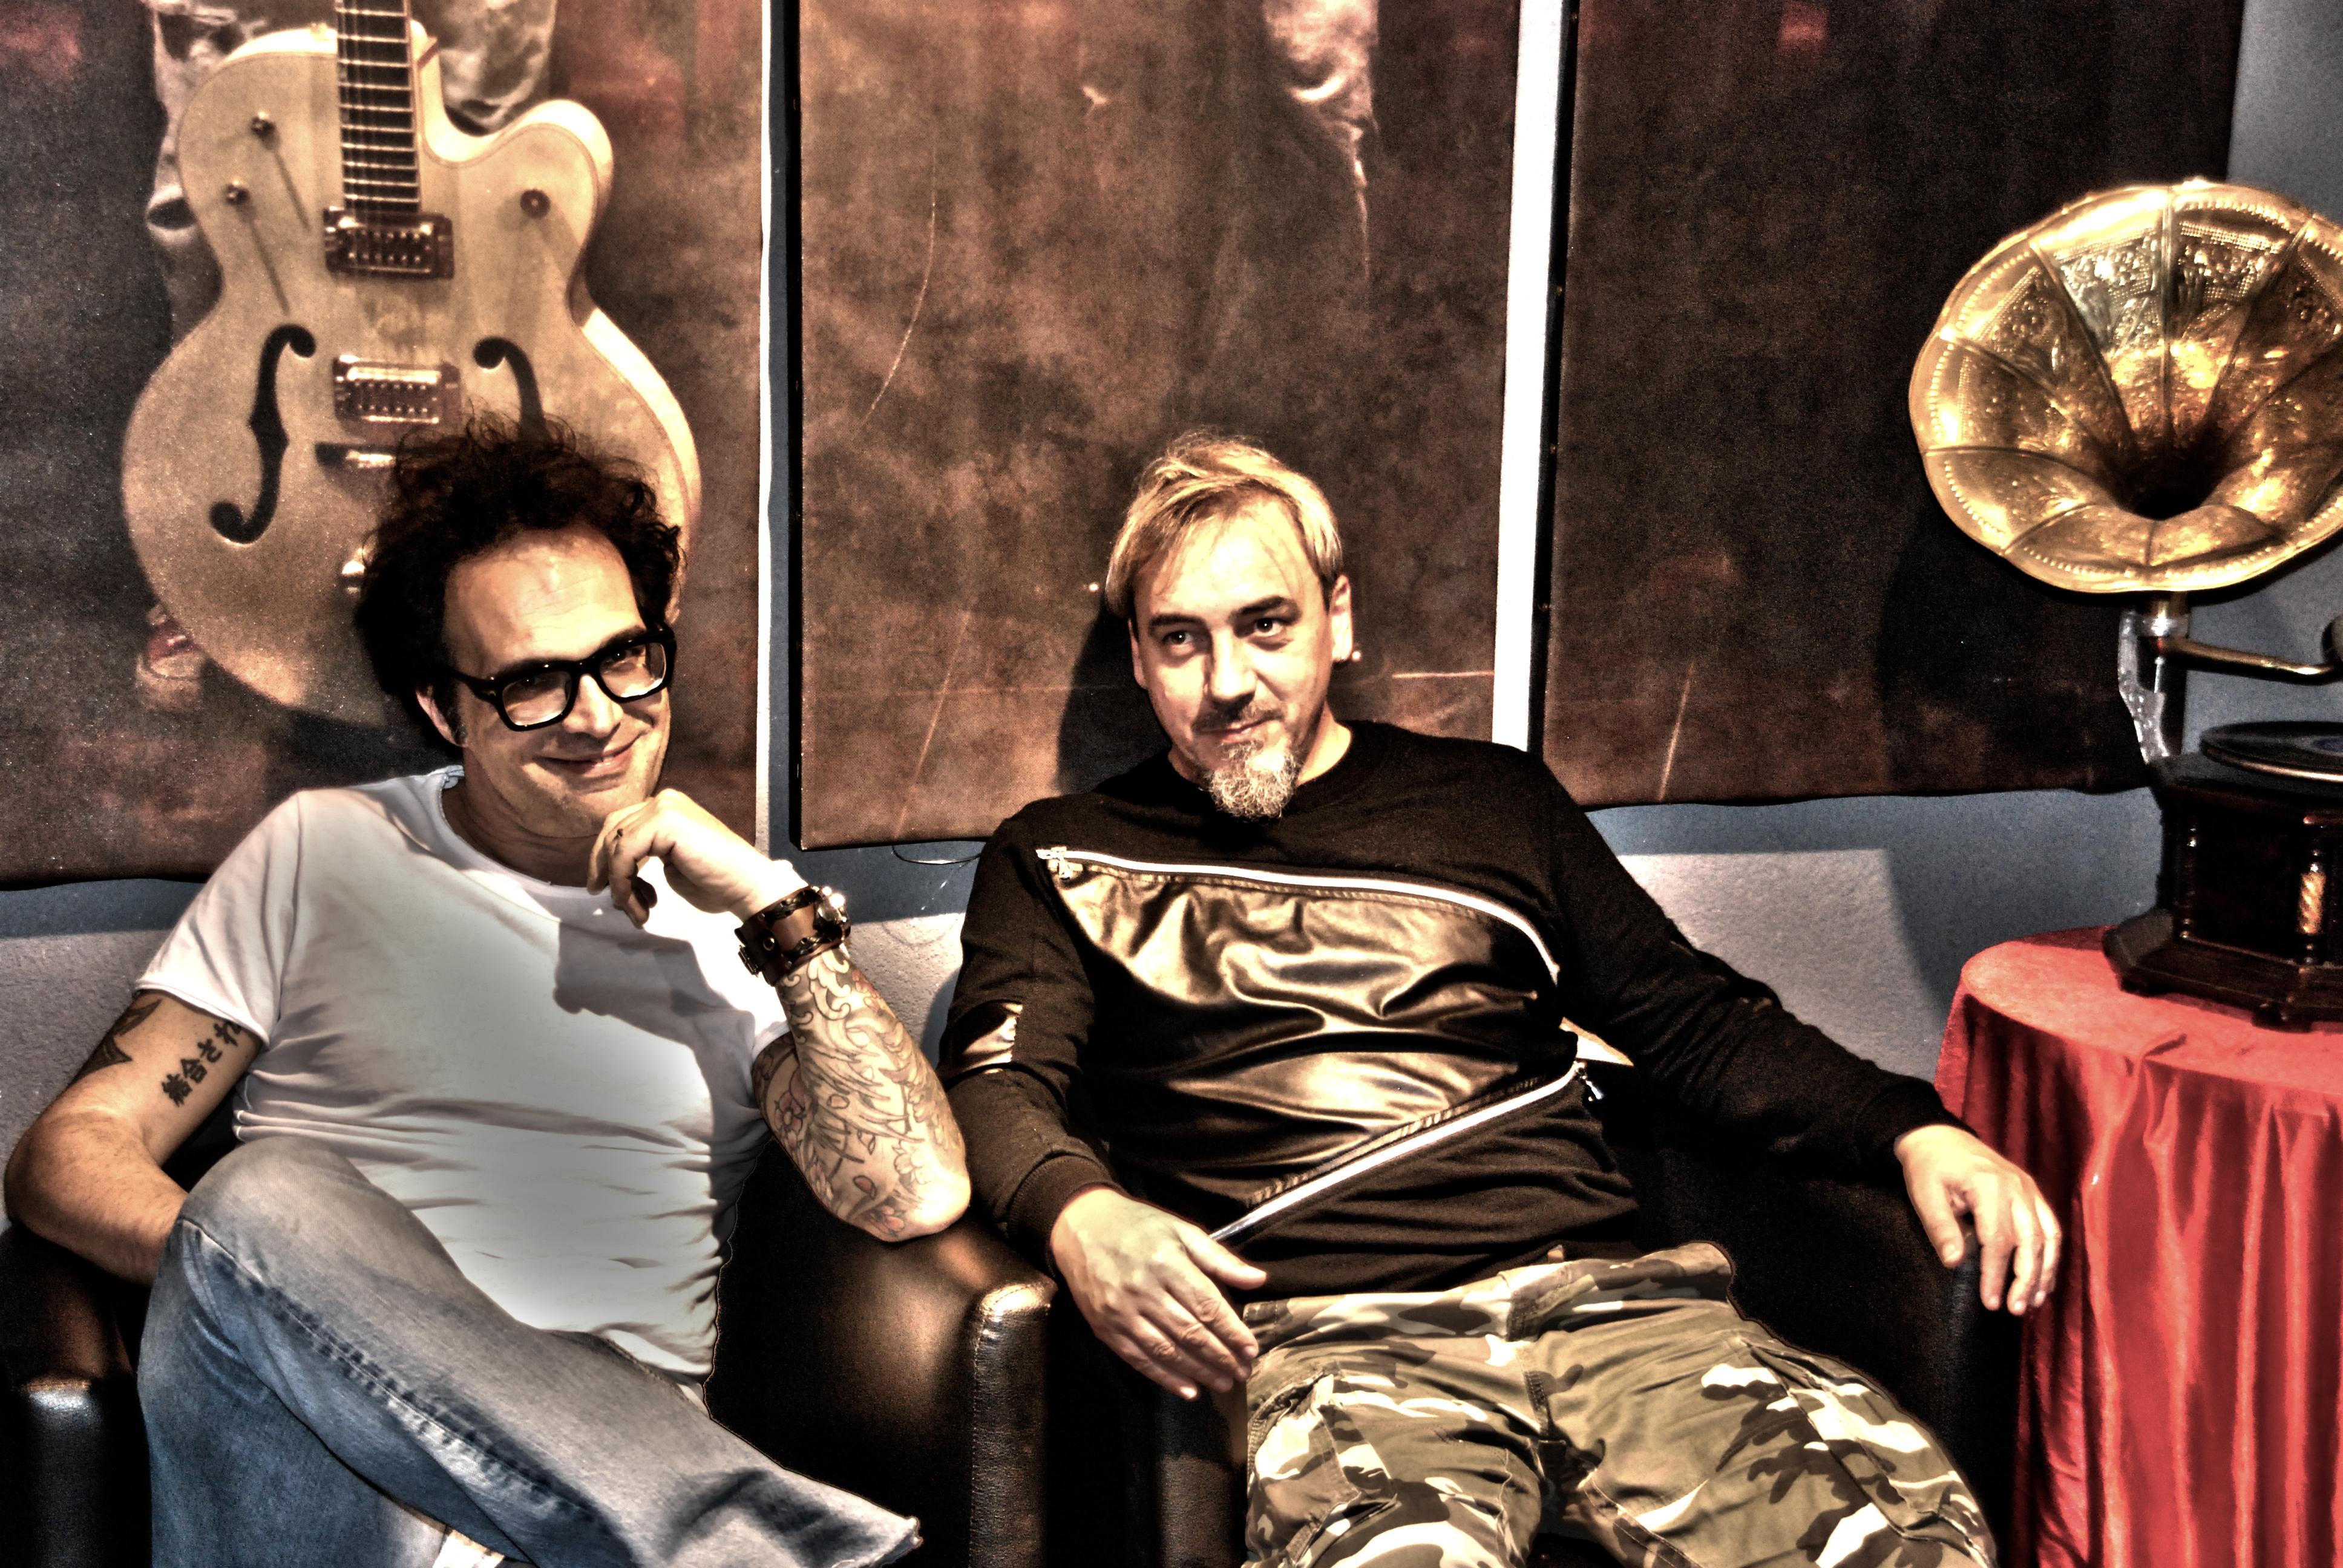 Steve Saluto & Gianluca Mosole